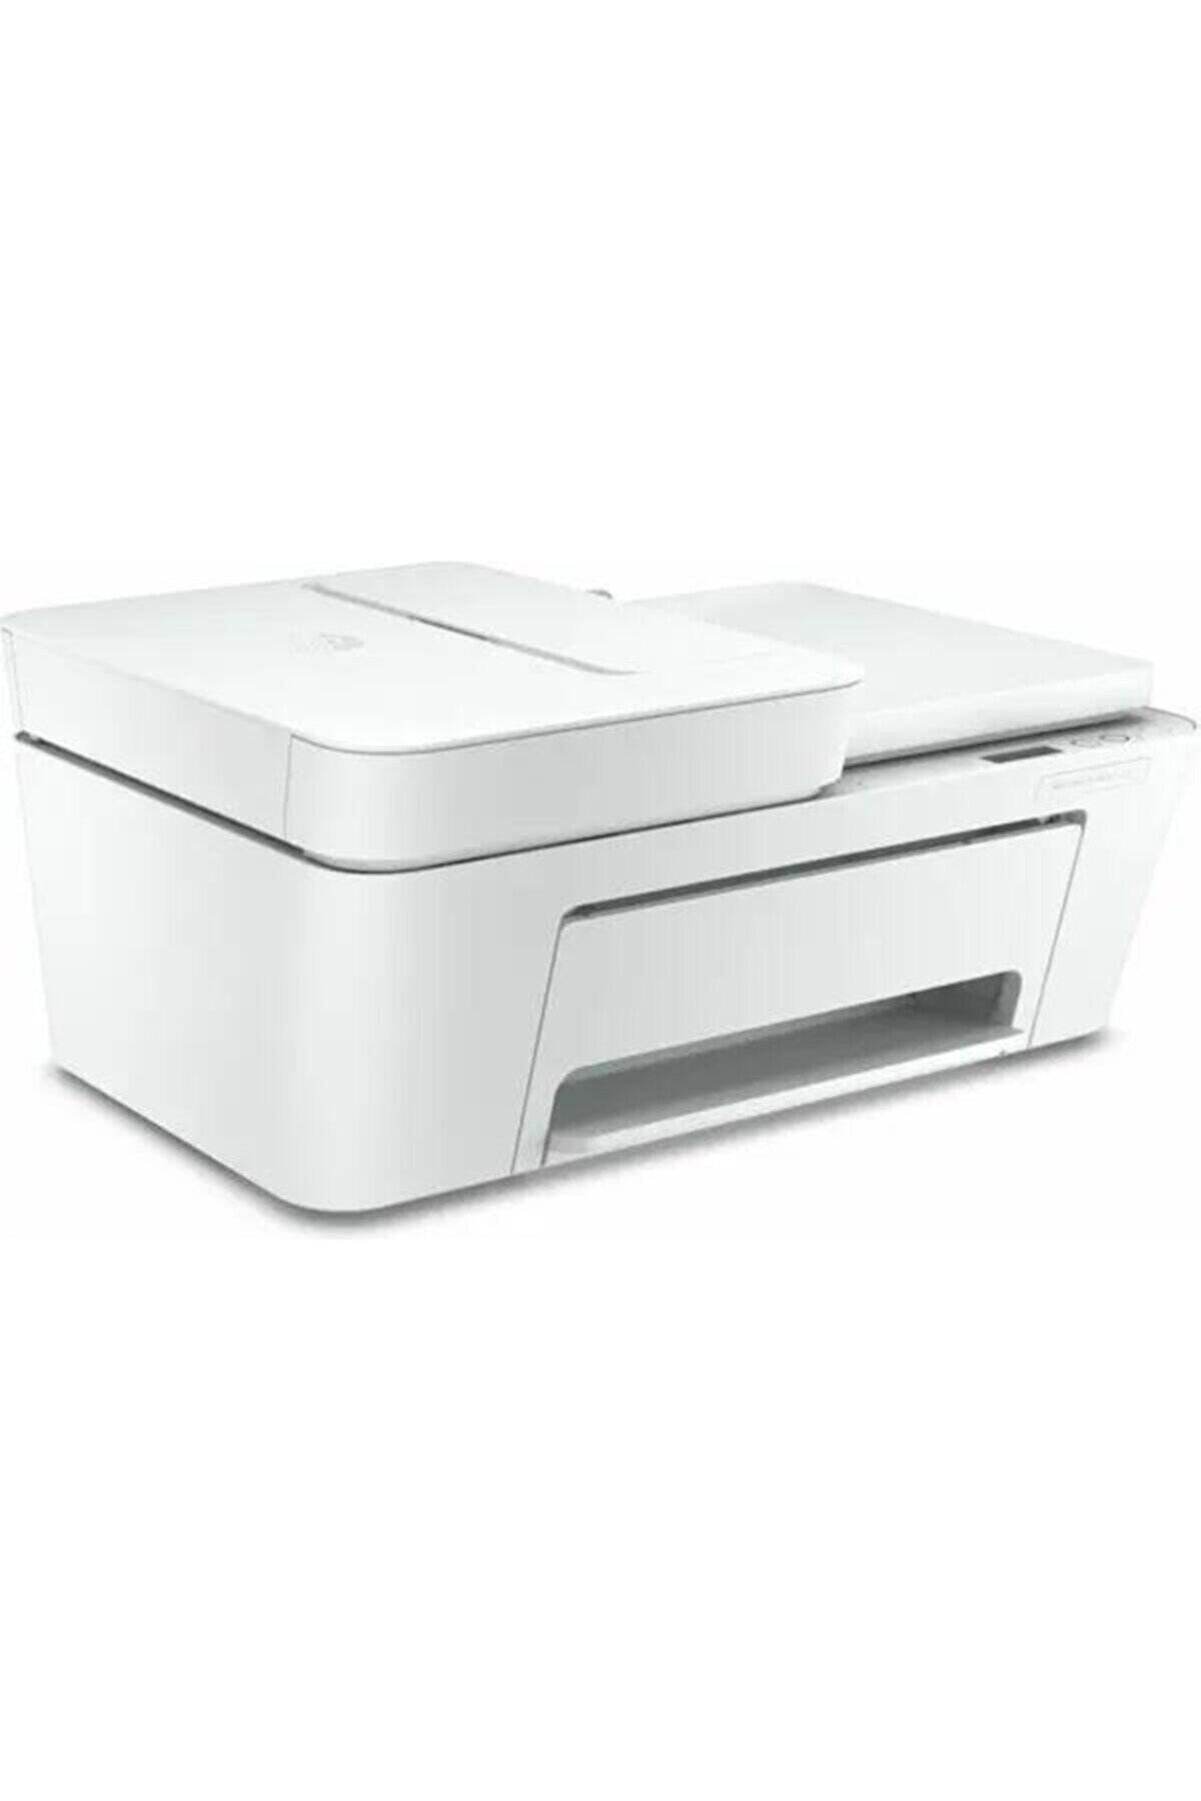 HP Deskjet Plus 4120 All-in-one Wi-fi Yazıcı 3xv14b